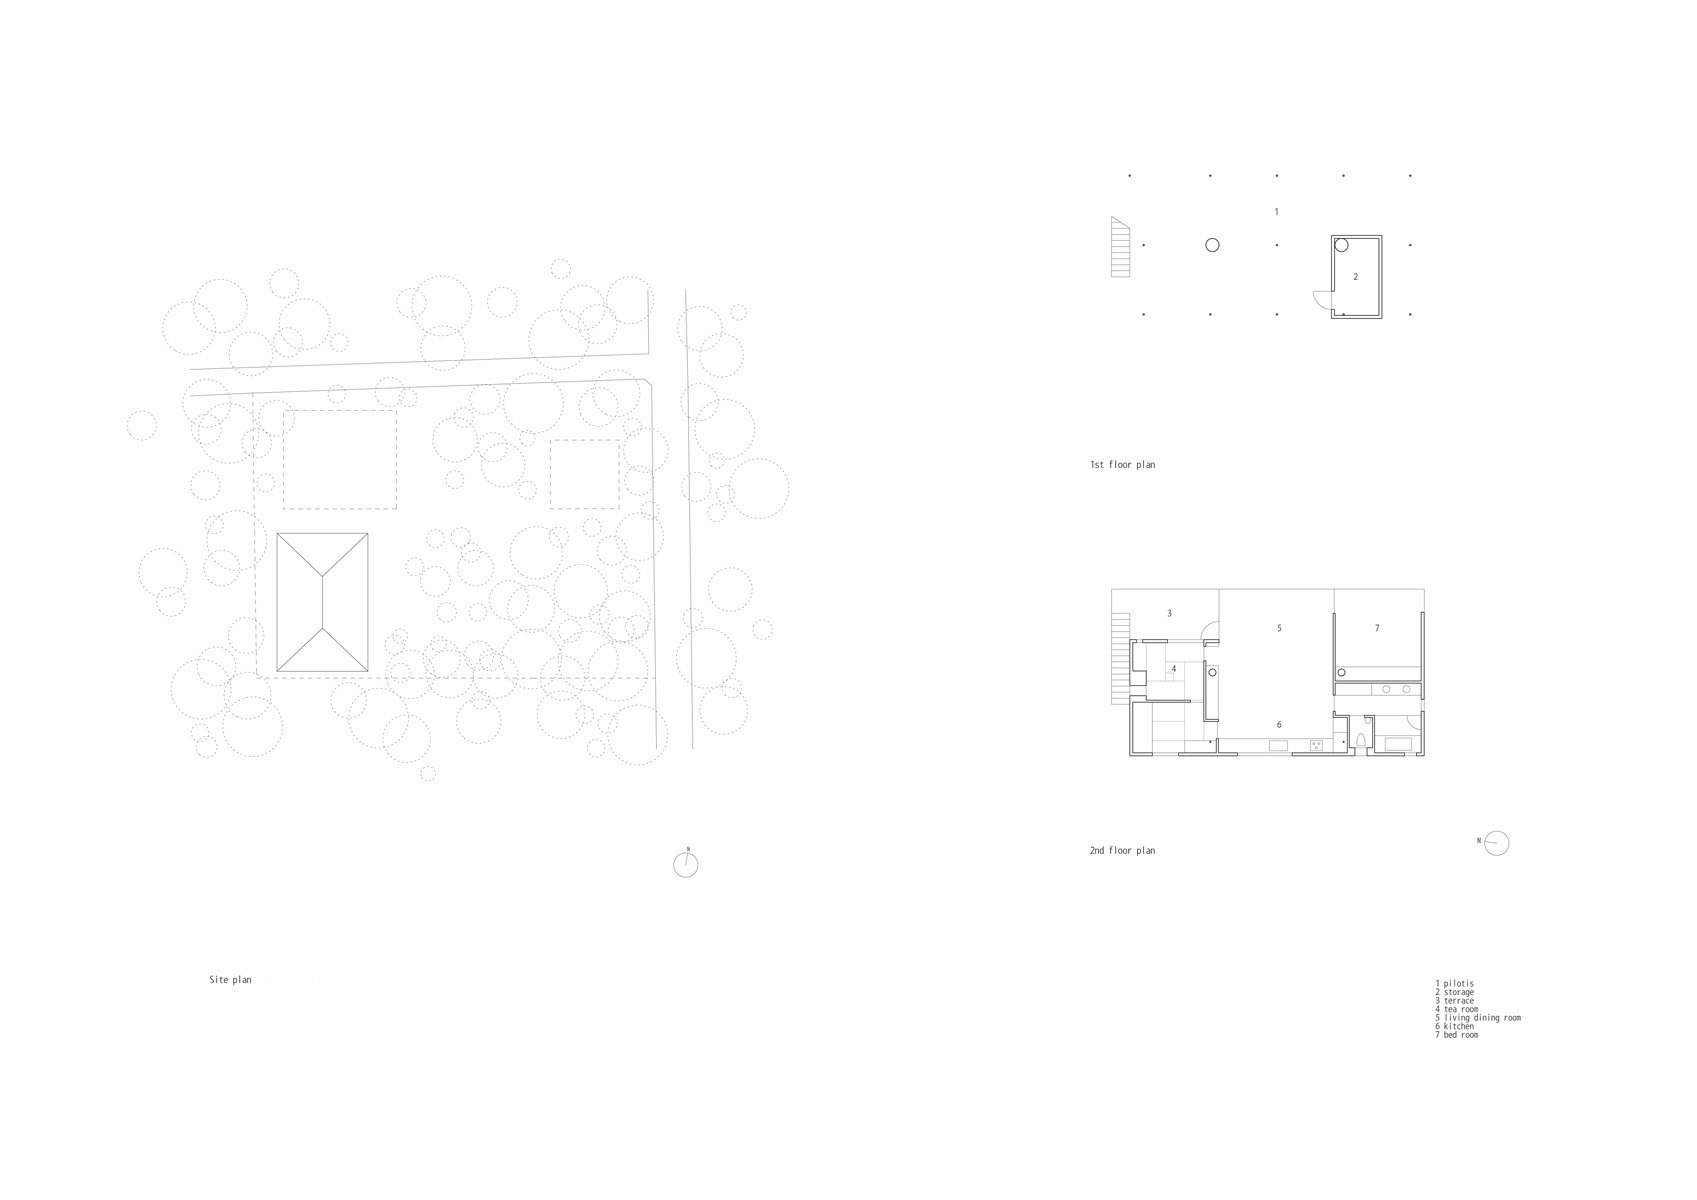 Mies Van Der Rohe Farnsworth House Interior